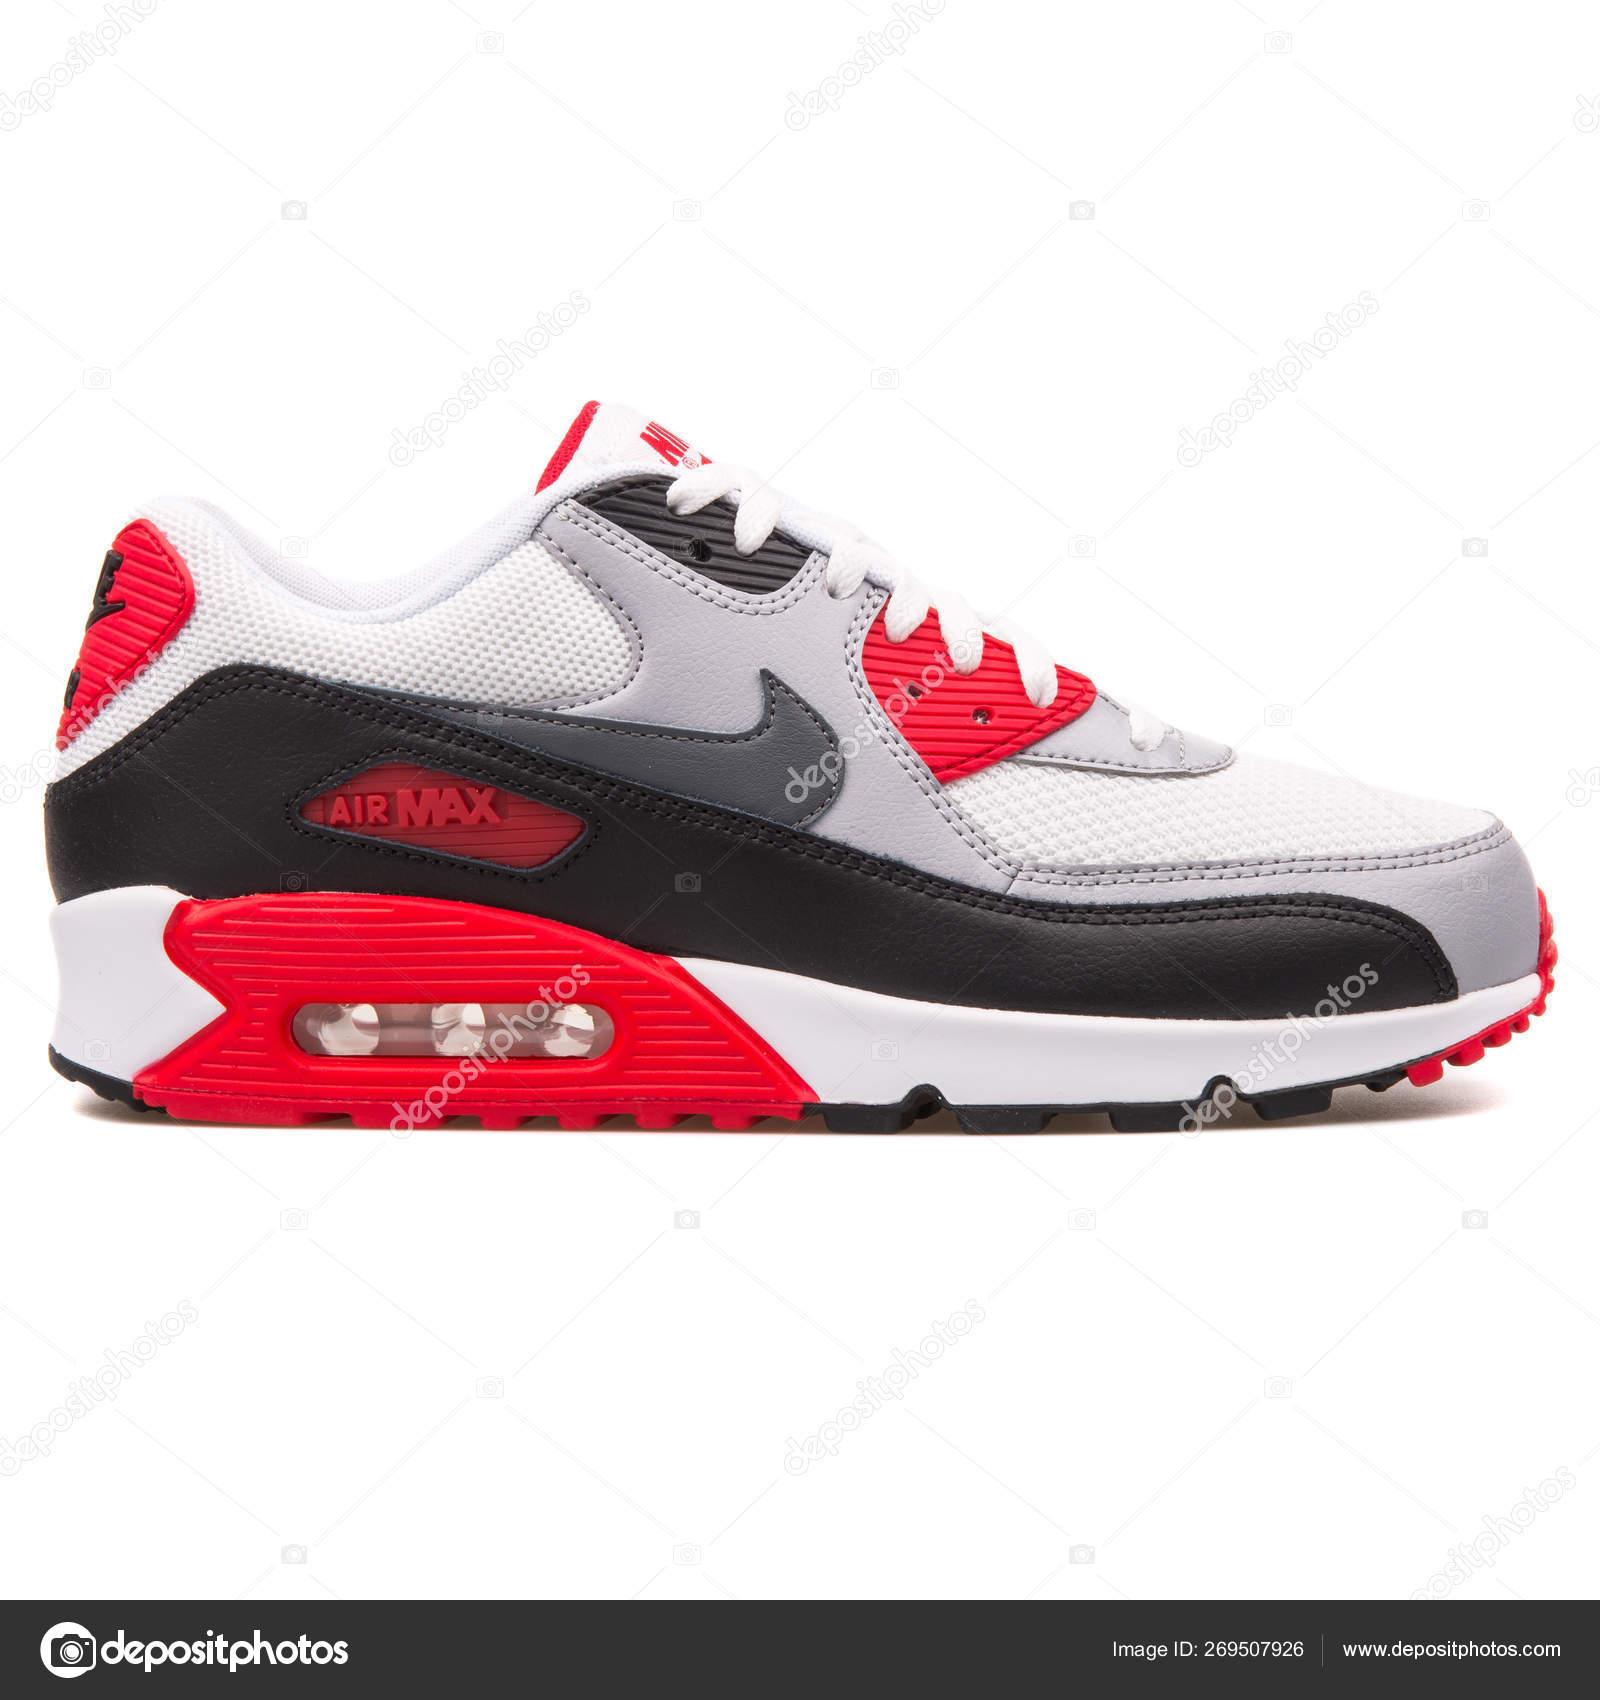 guapo exuberante en diseño hombre Nike Air Max 90 Essential white, black, grey and red sneaker – Stock  Editorial Photo © xMarshallfilms #269507926